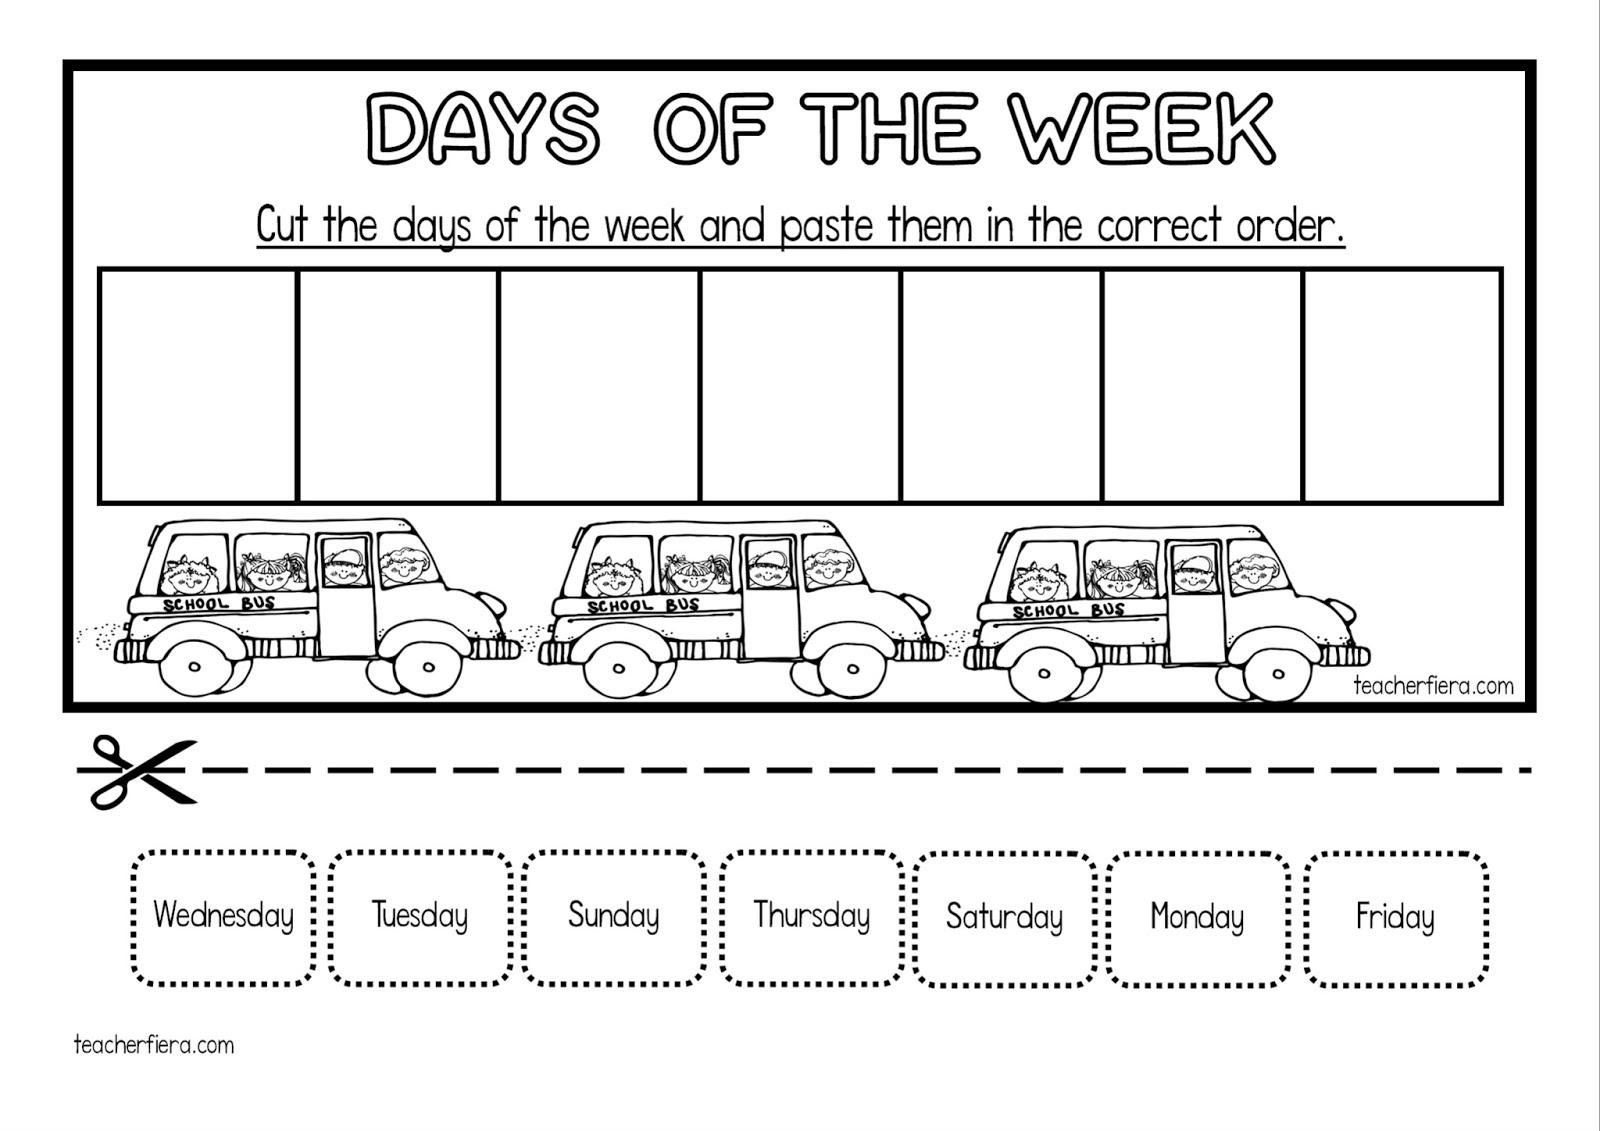 TEACHER FIERA'S ASSEMBLAGE: DAYS OF THE WEEK